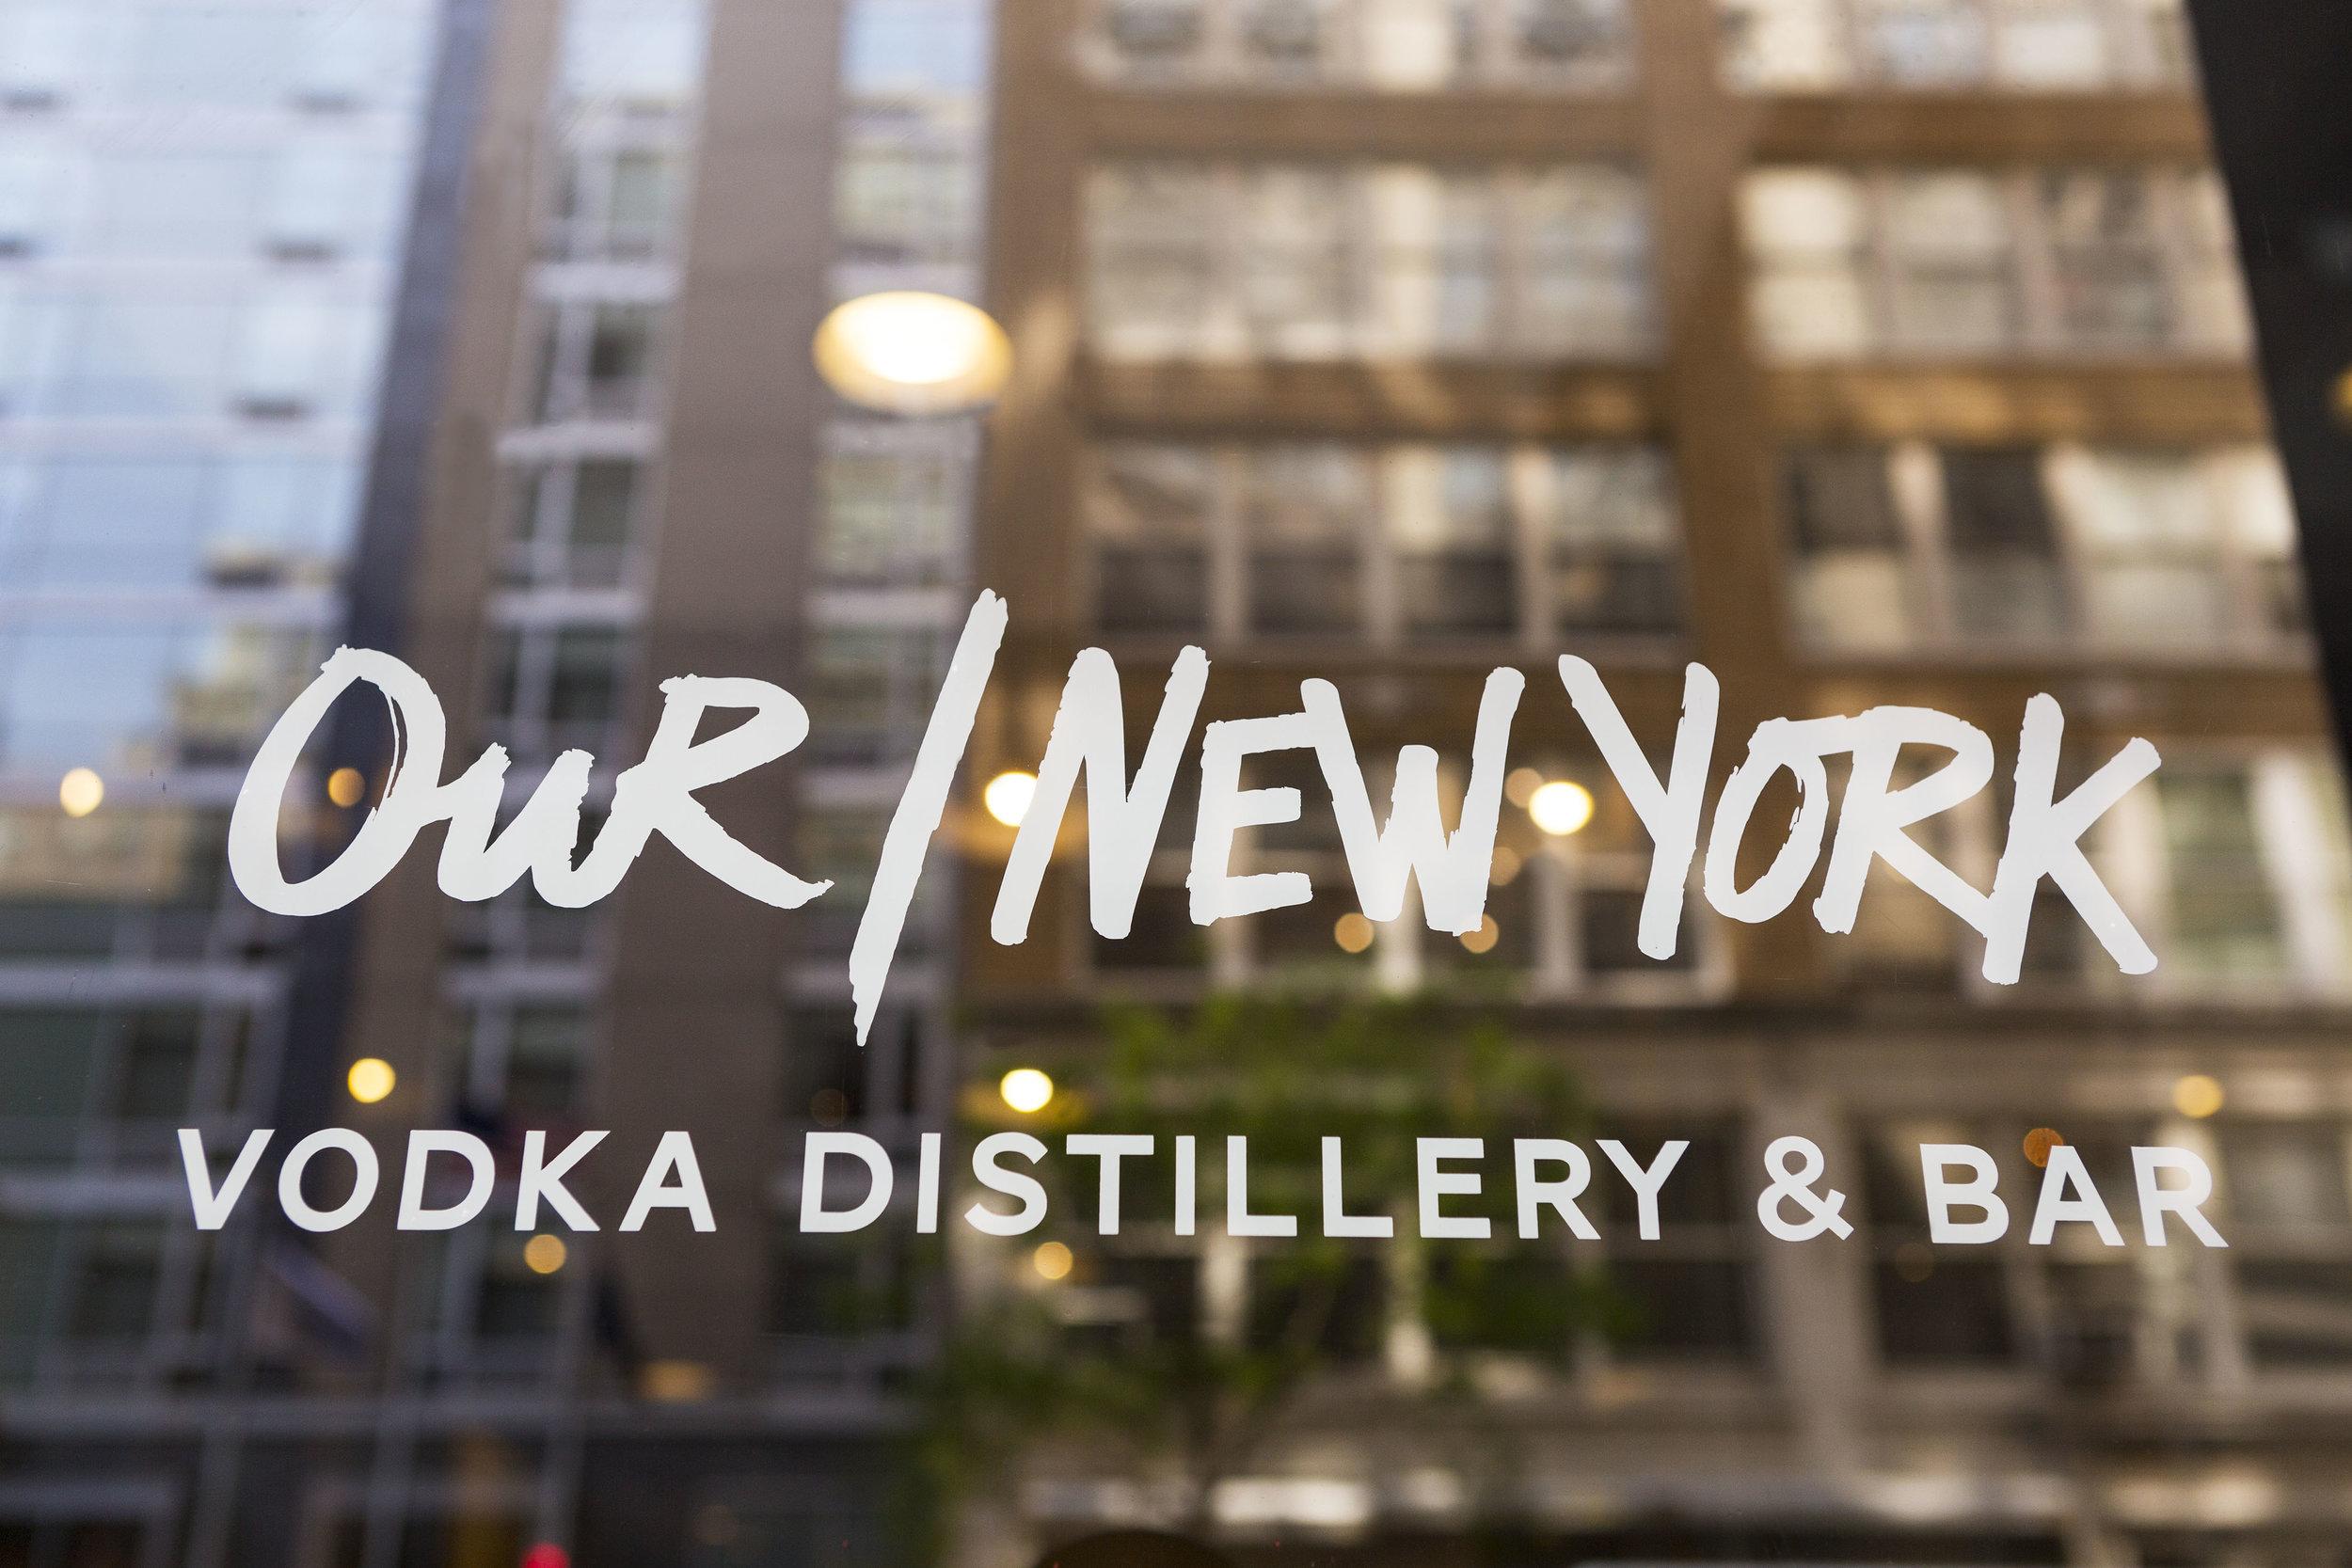 press-distillery-bar-OurVodkaNYC-0367.jpg